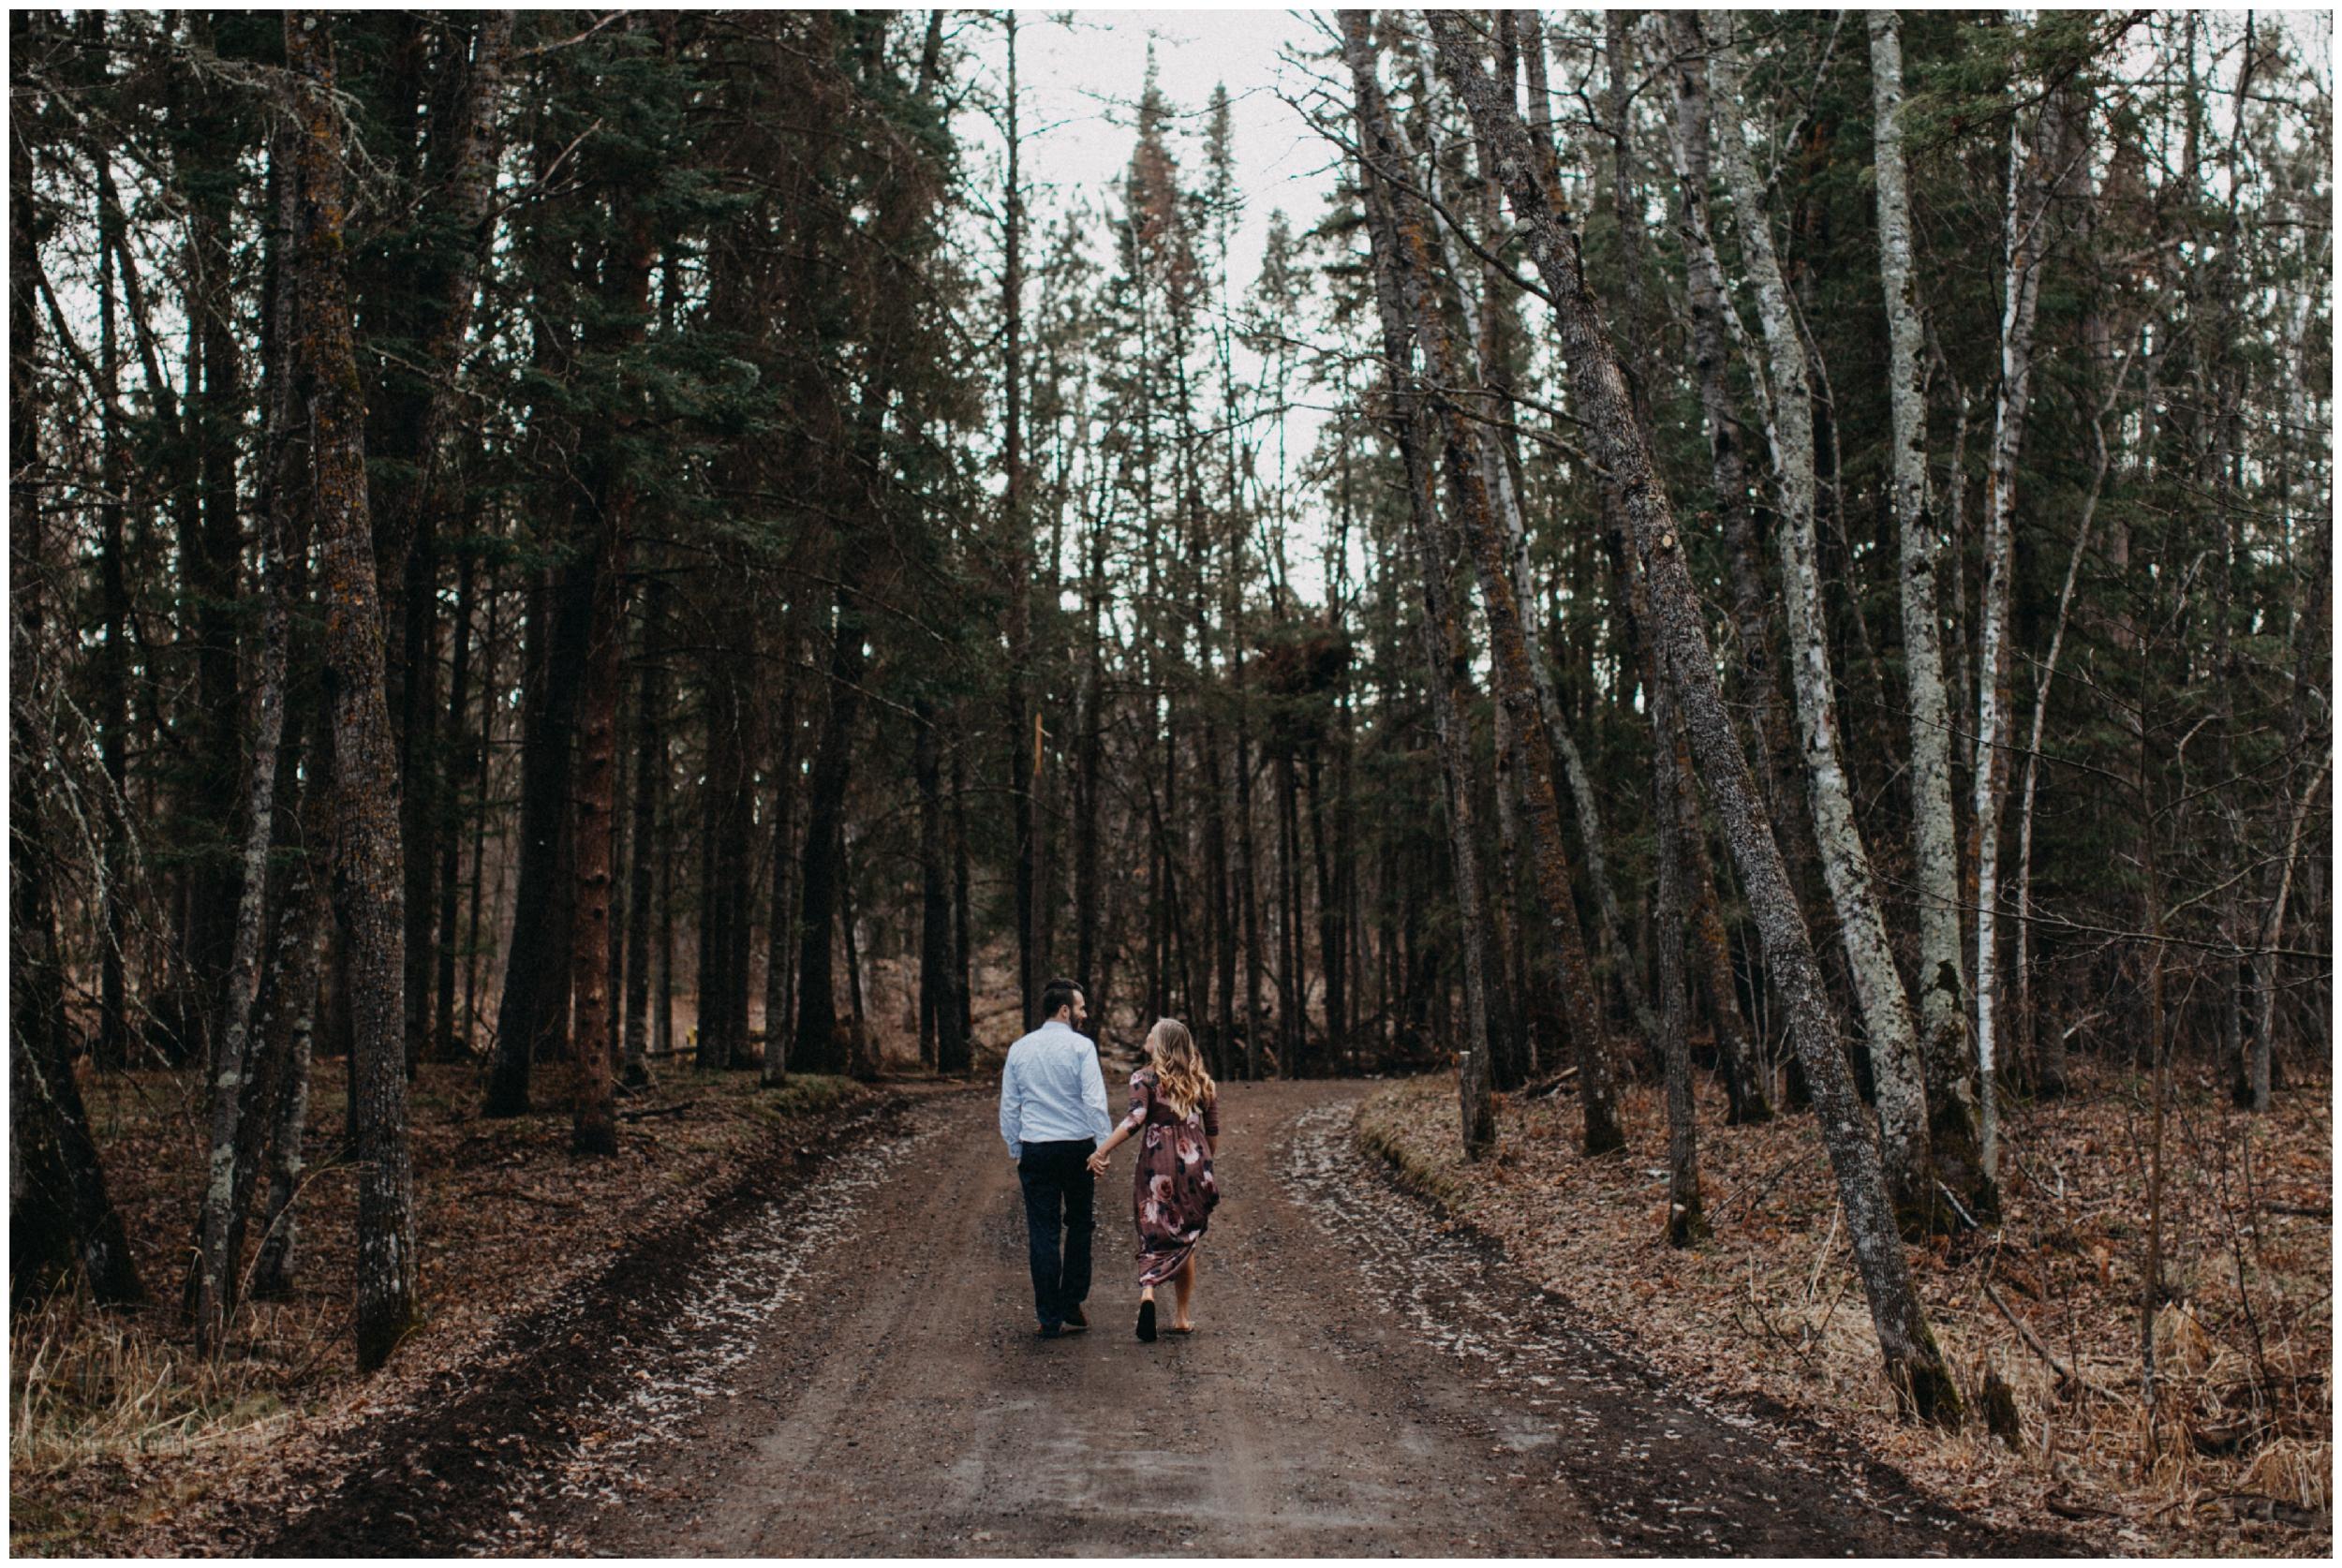 Minnesota northwoods engagement session